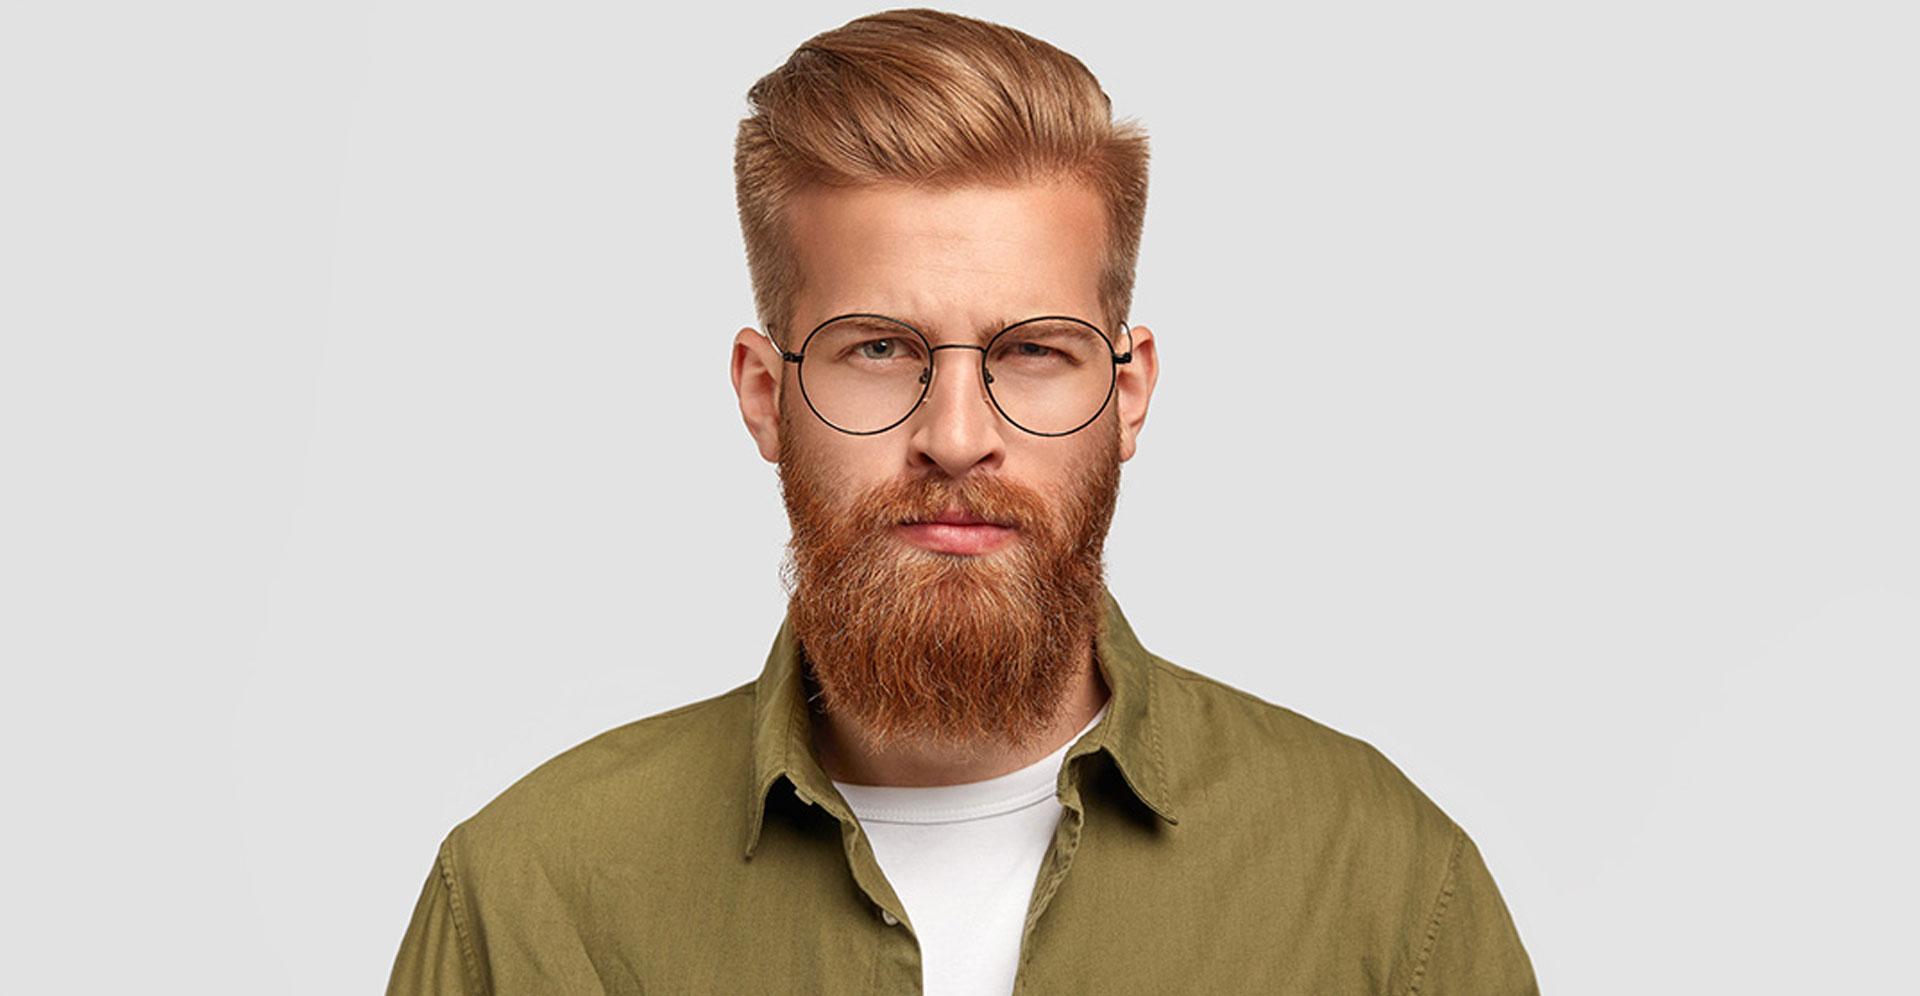 Beard Transplantation